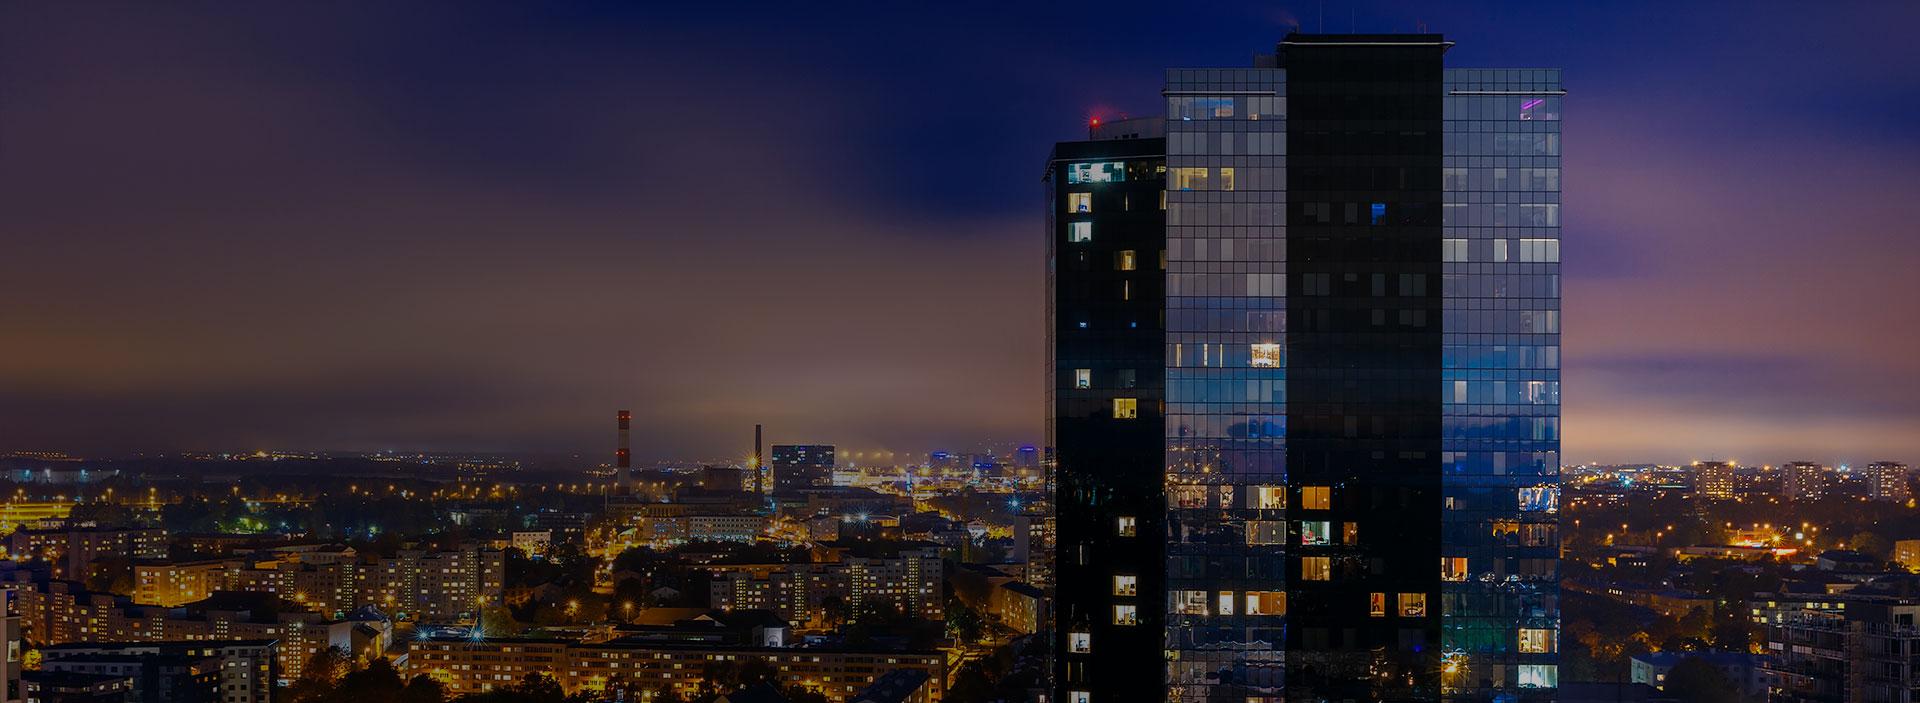 IT outsourcing destinations overview: Estonia, Latvia, Lithuania